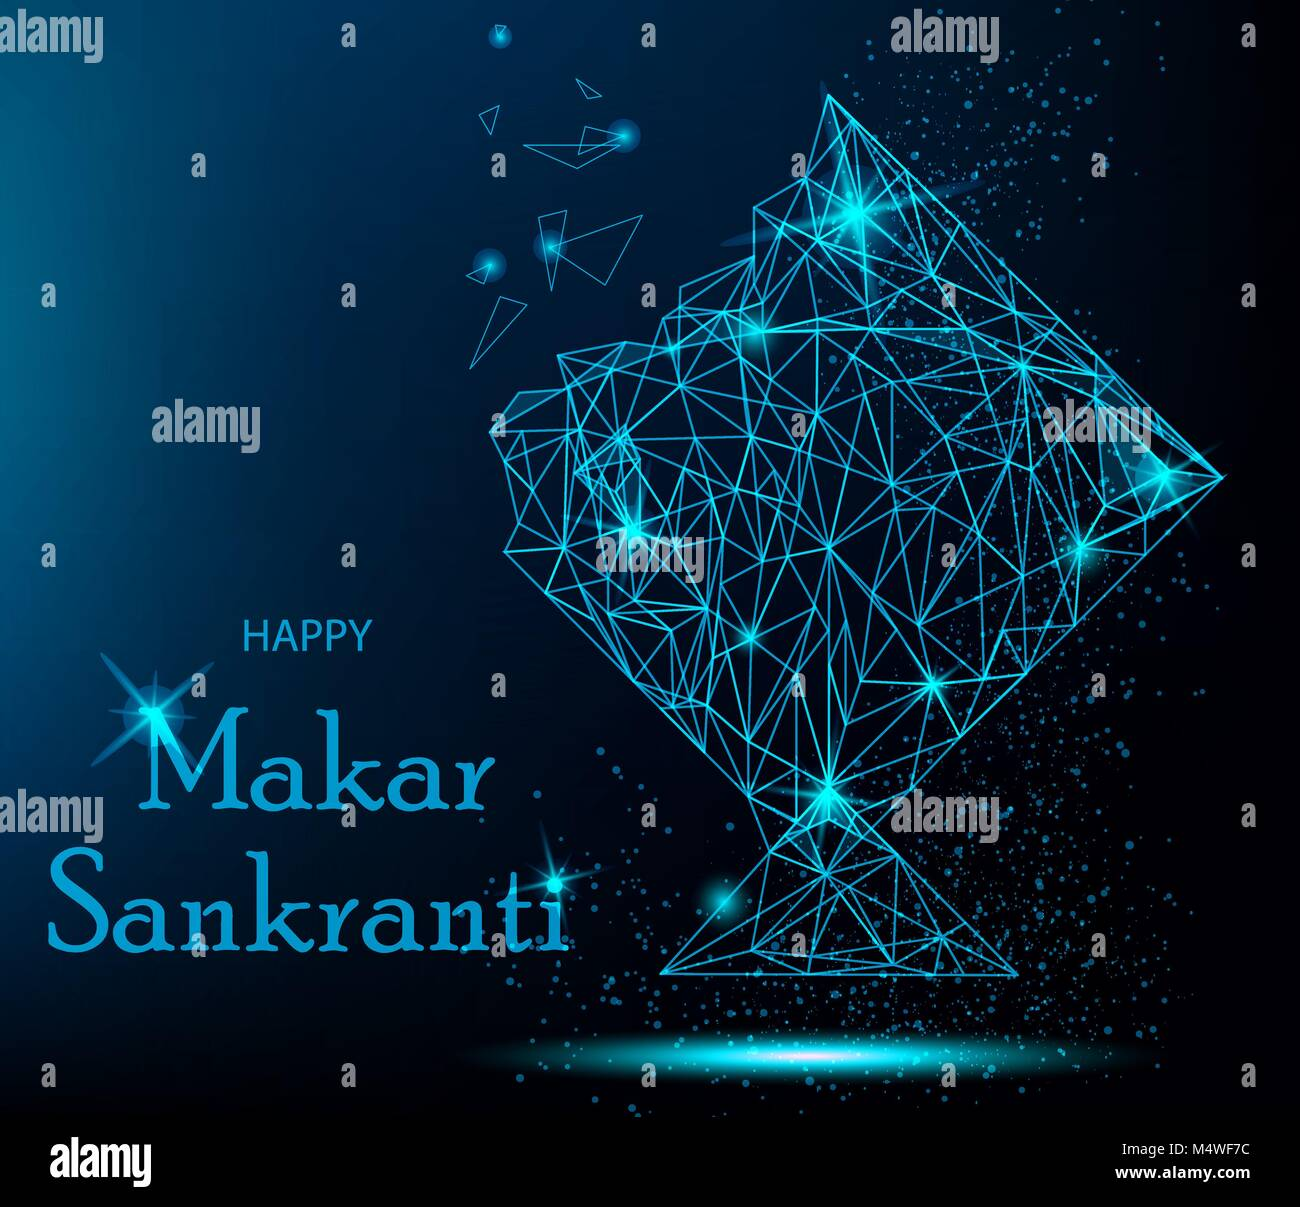 Sankranti Kite Stock Photos Sankranti Kite Stock Images Alamy